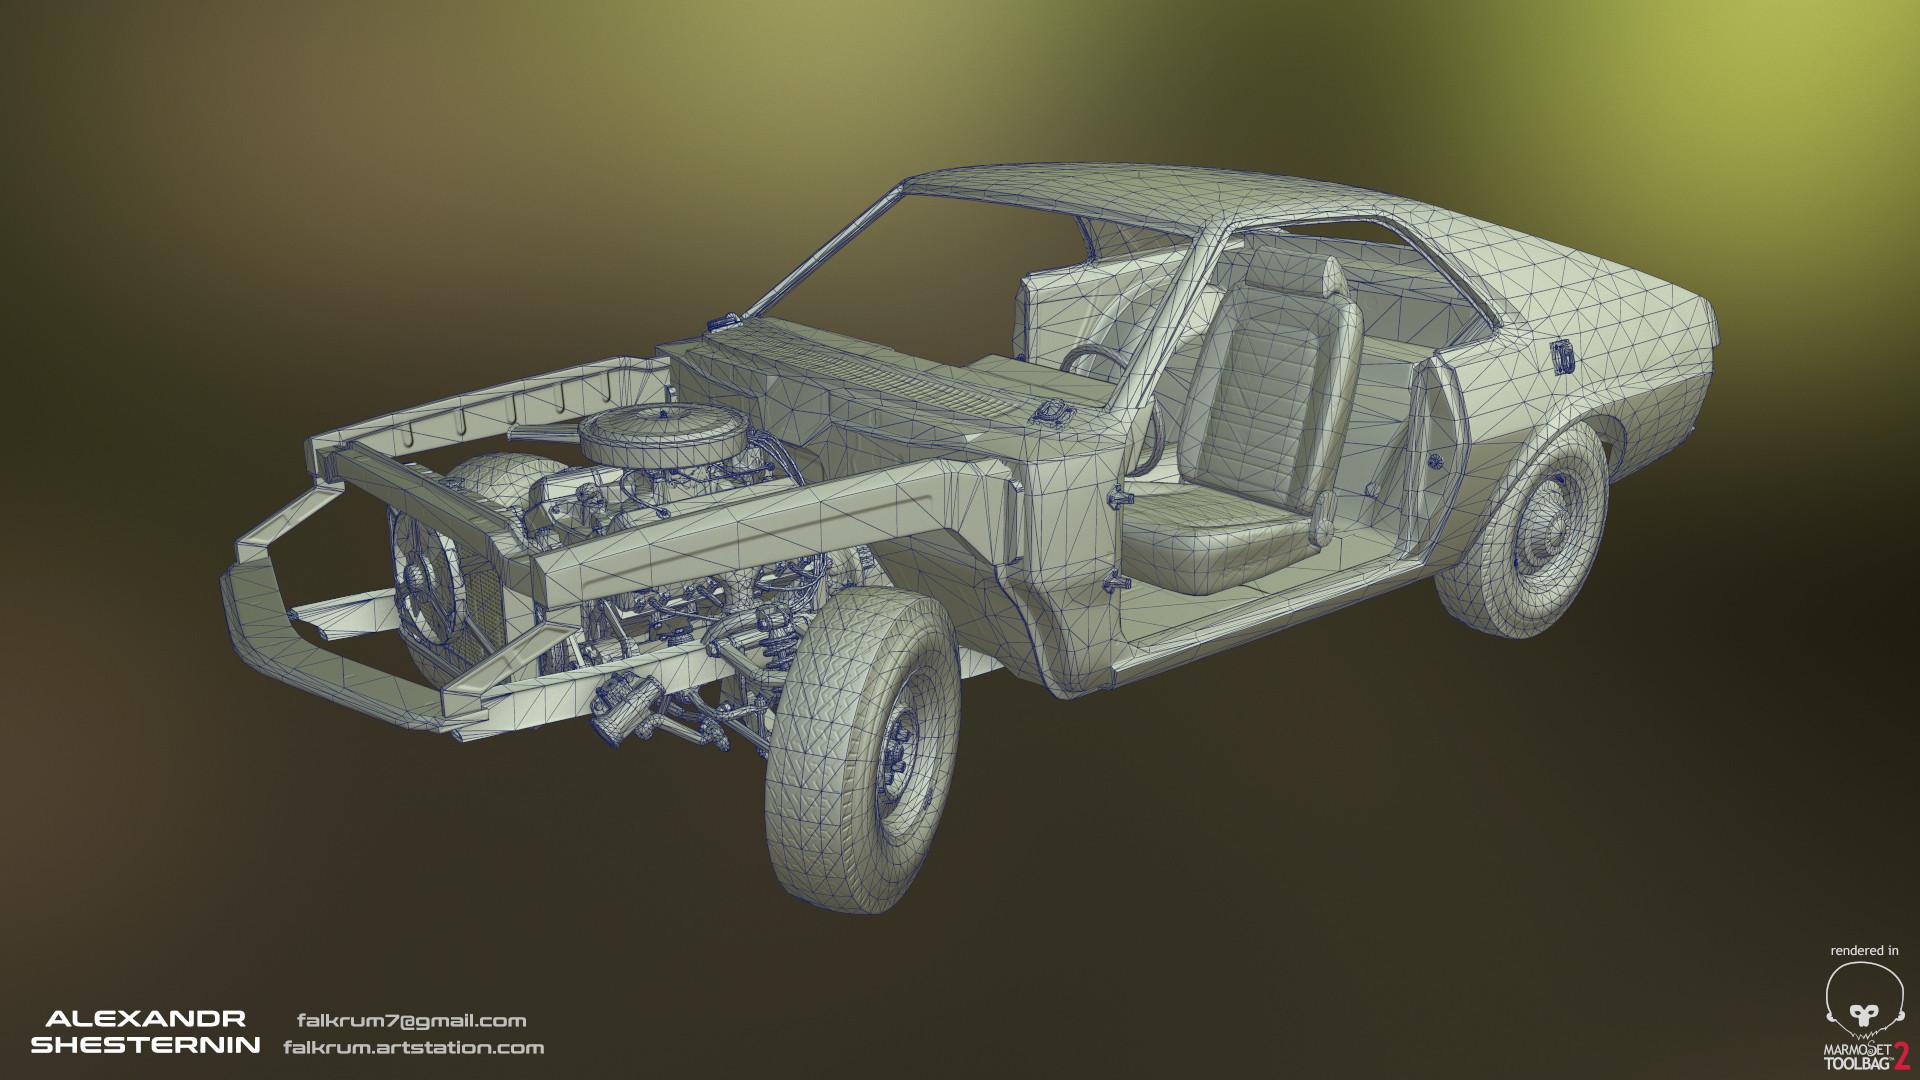 Alexandr shesternin modular abandoned car11